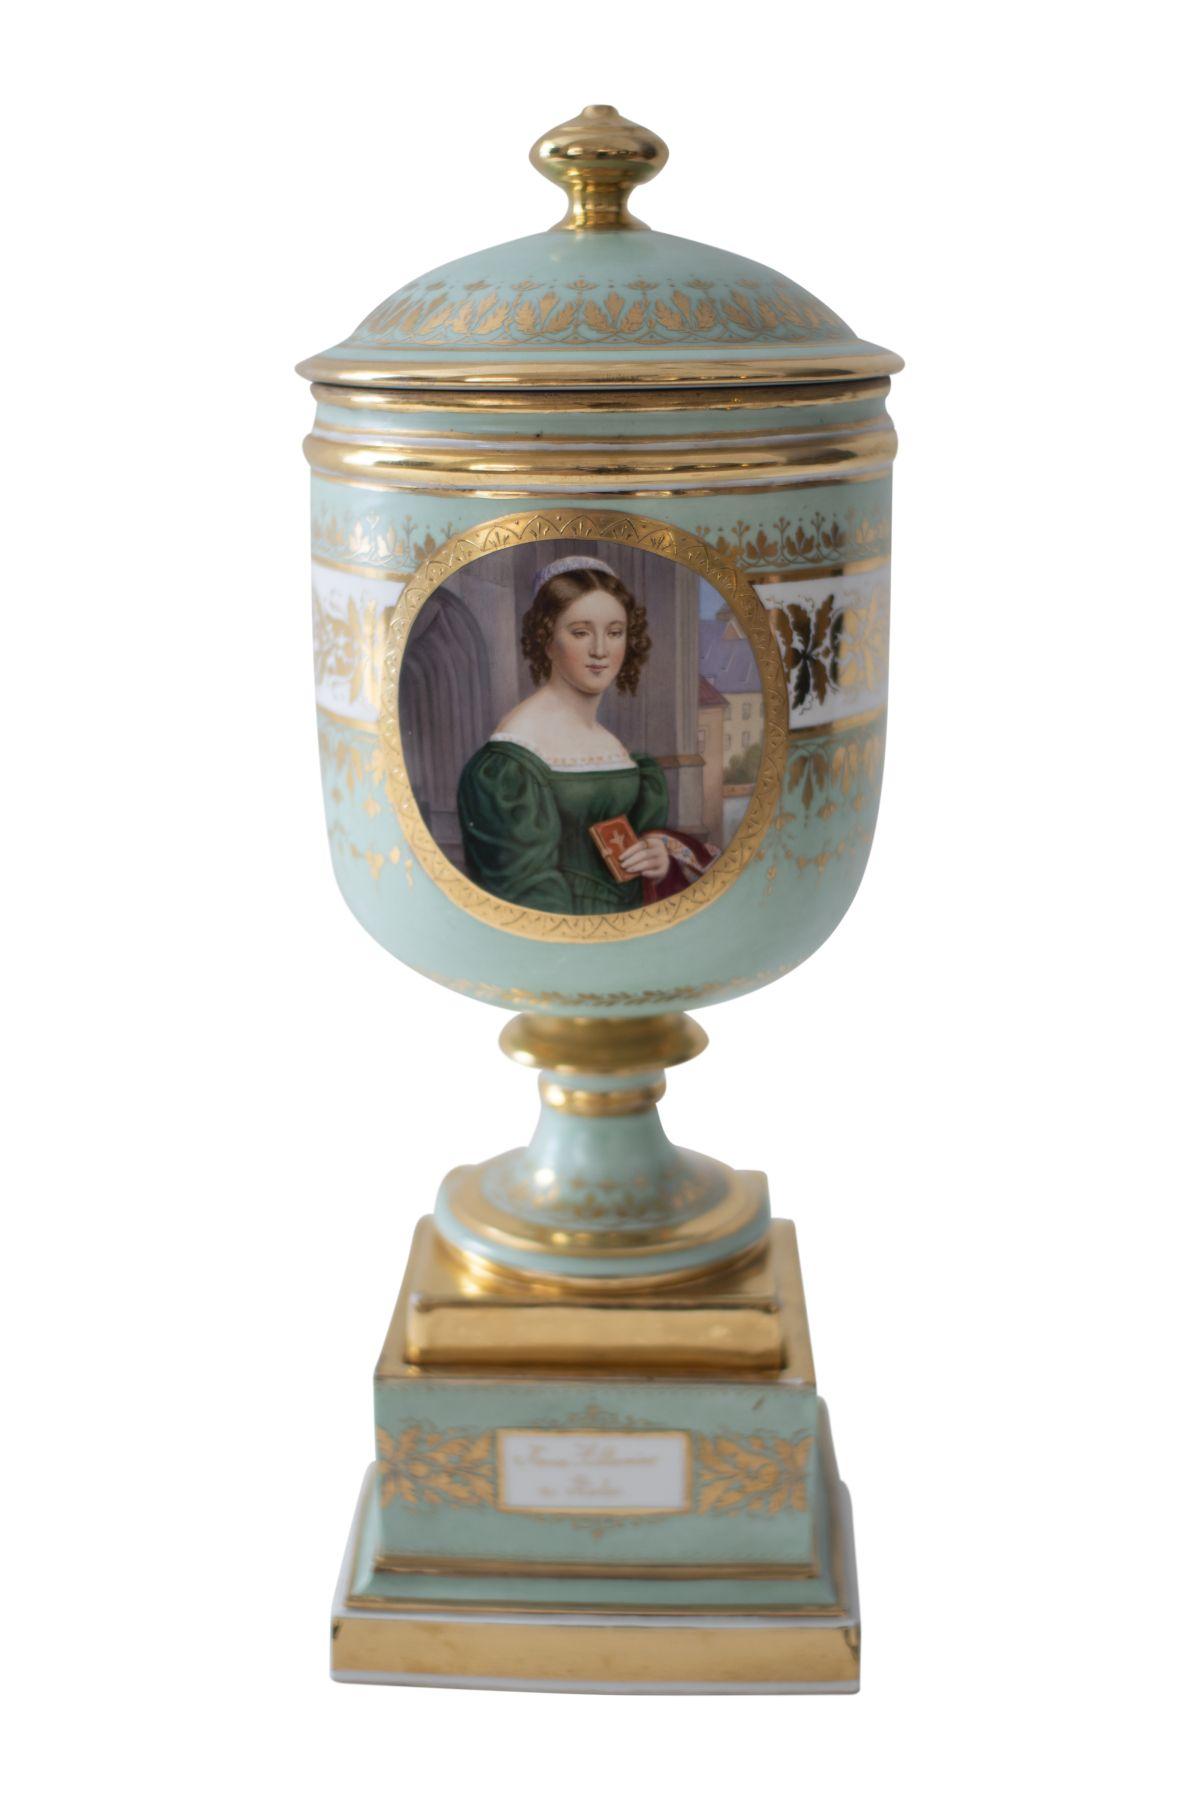 #55 Attributed to Joseph Karl Stieler (1781–1858), Biedermeier Trophy   Zugeschrieben Joseph Karl Stieler (1781–1858), Biedermeier Pokal Image